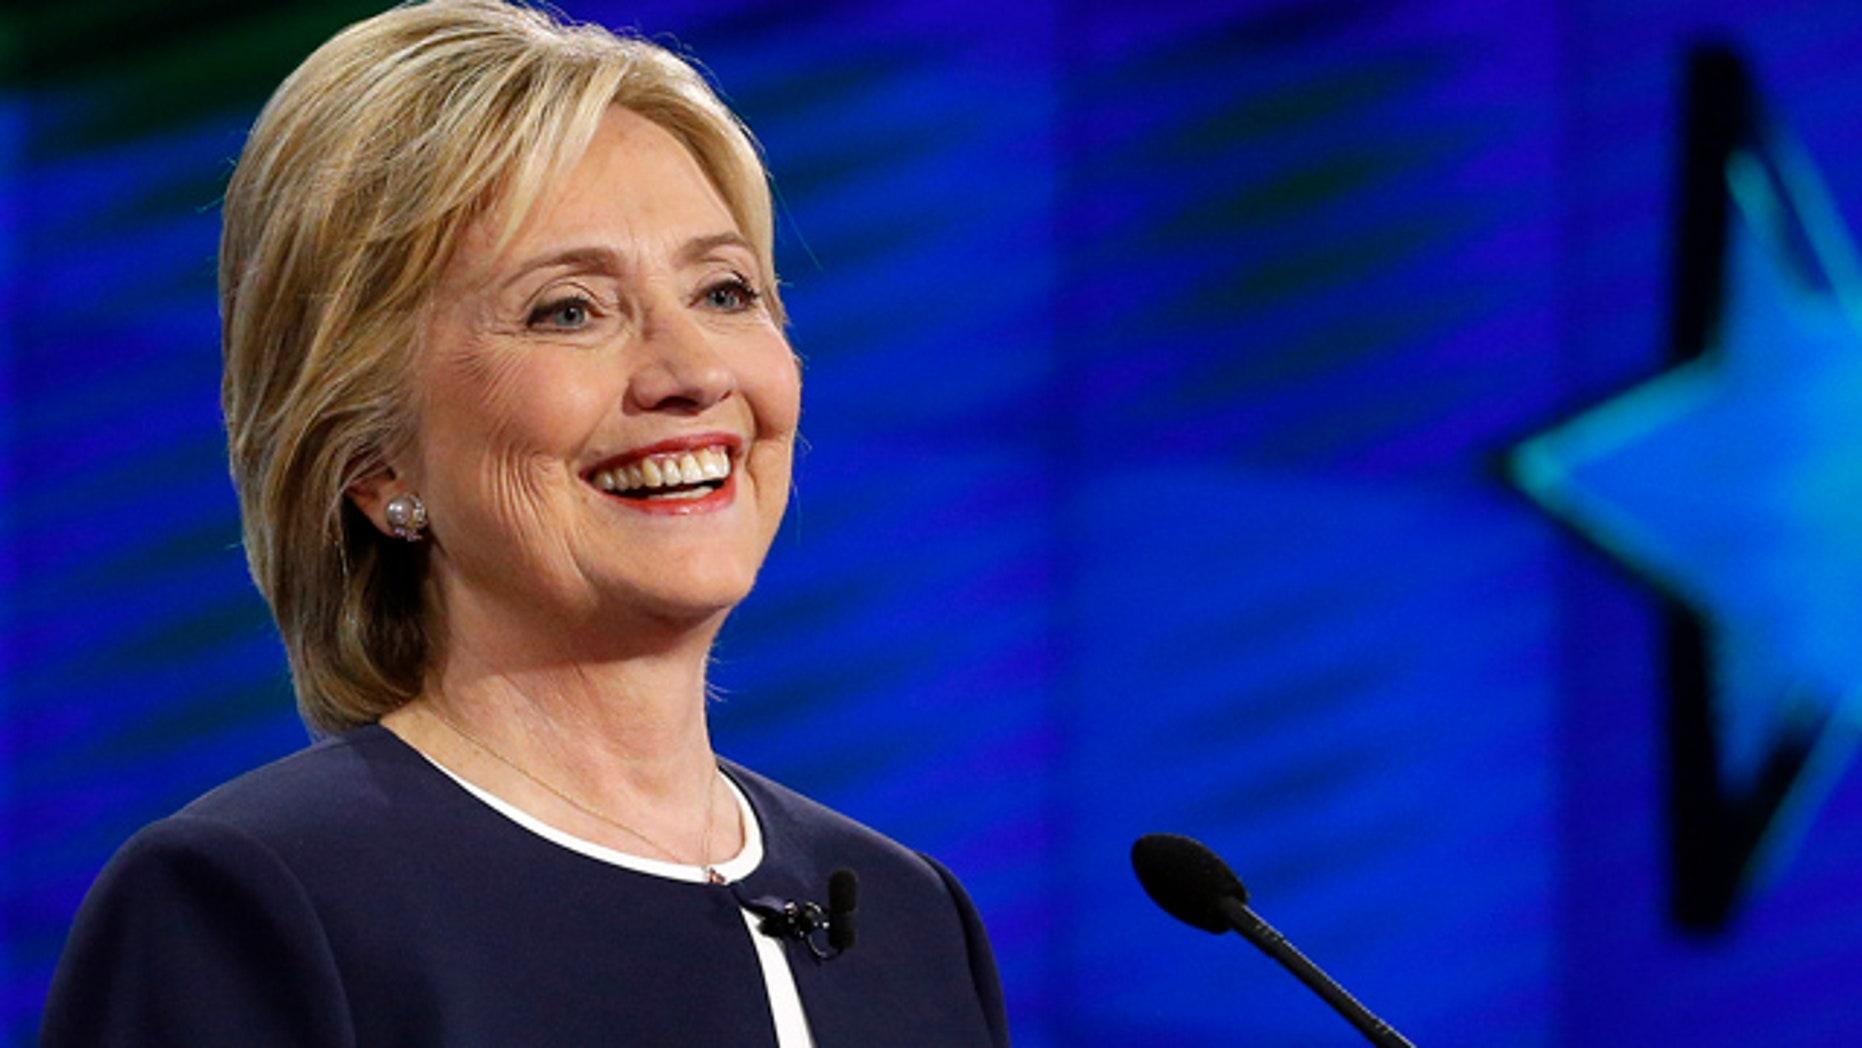 Oct. 13, 2015: Hillary Rodham Clinton smiles during the CNN Democratic presidential debate in Las Vegas. (AP Photo/John Locher)